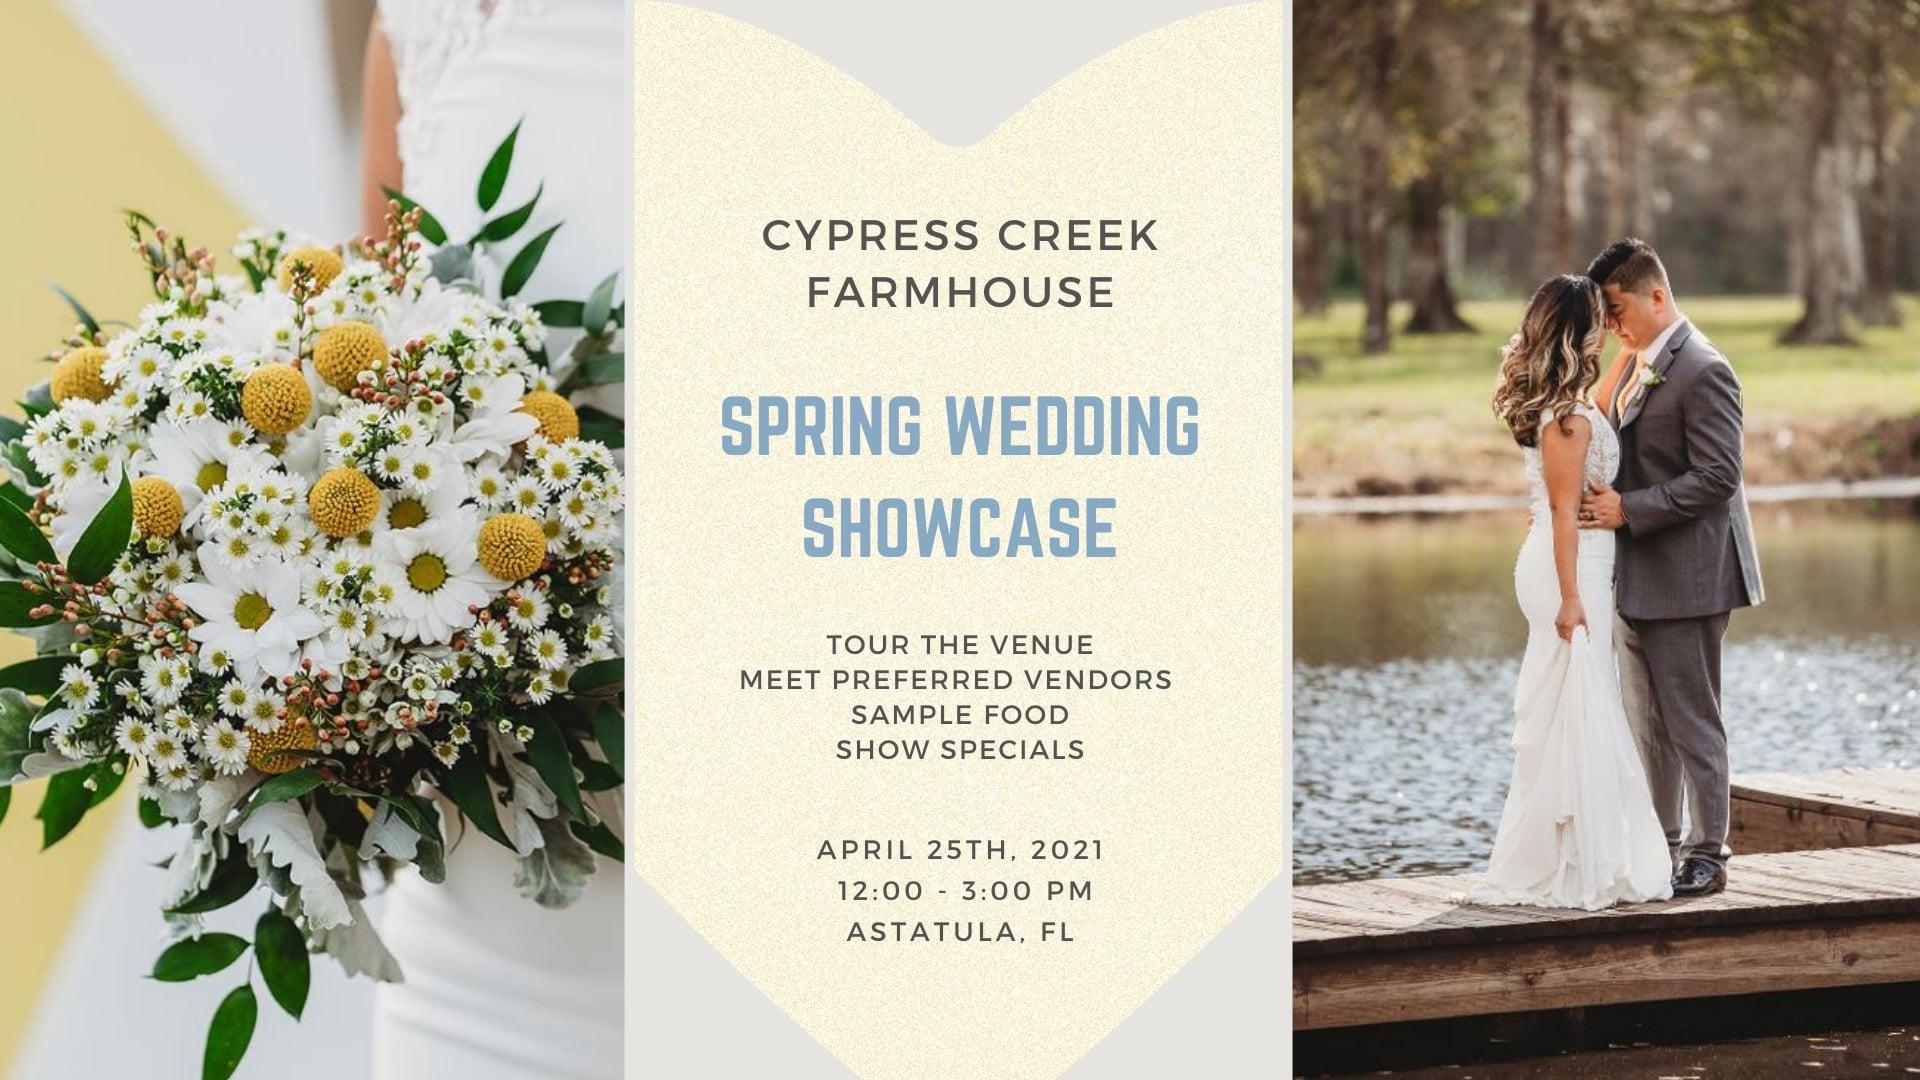 Spring Wedding Showcase at Cypress Creek Farmhouse